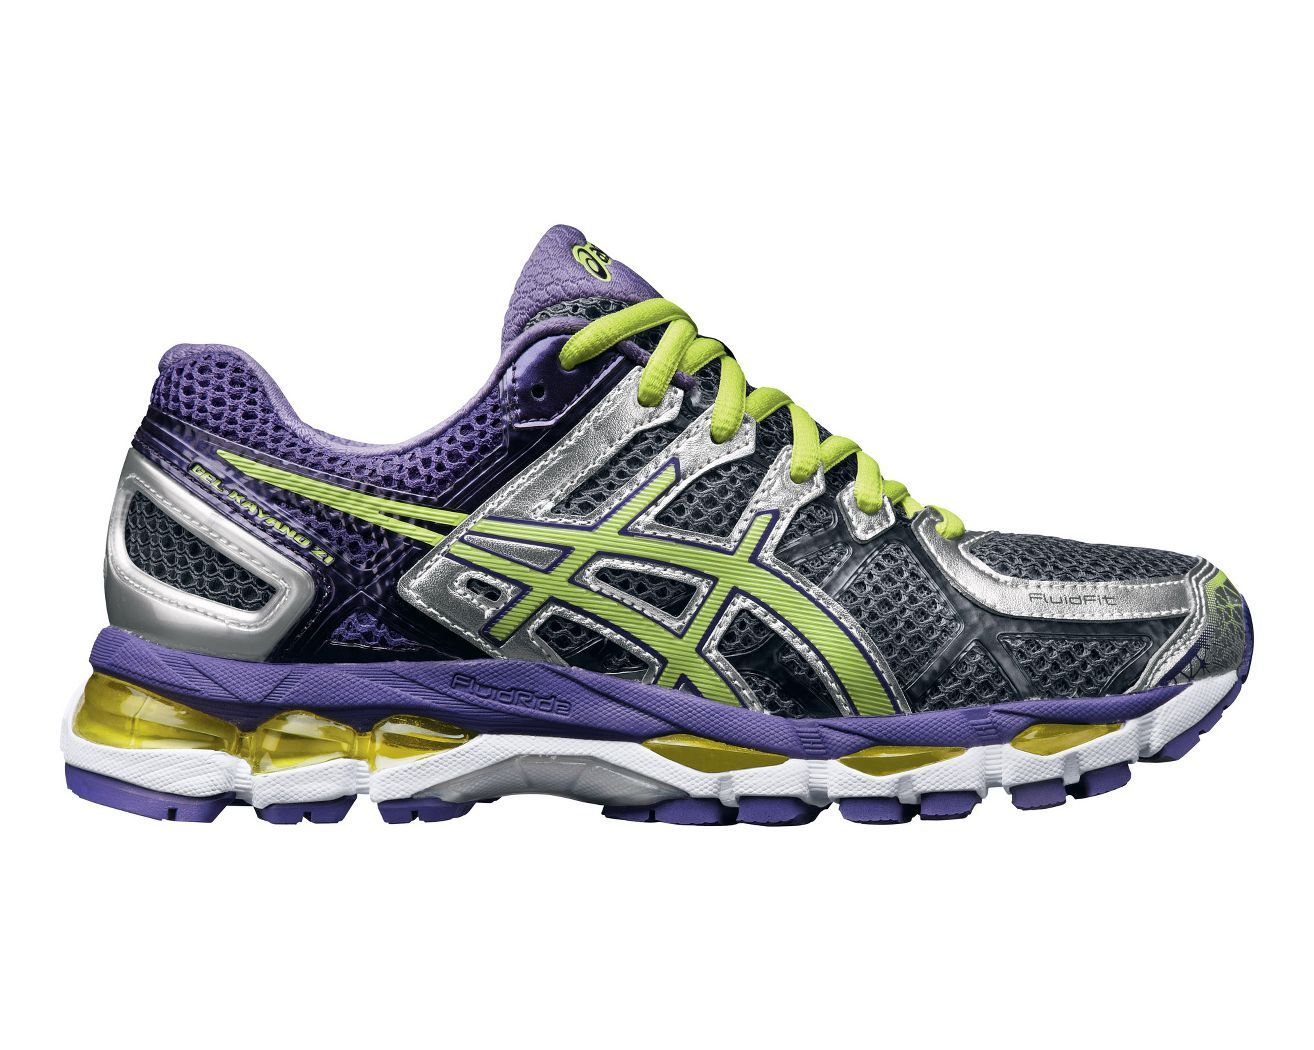 Womens ASICS GEL-Kayano 21 Running Shoe at Road Runner Sports 519d957b5c